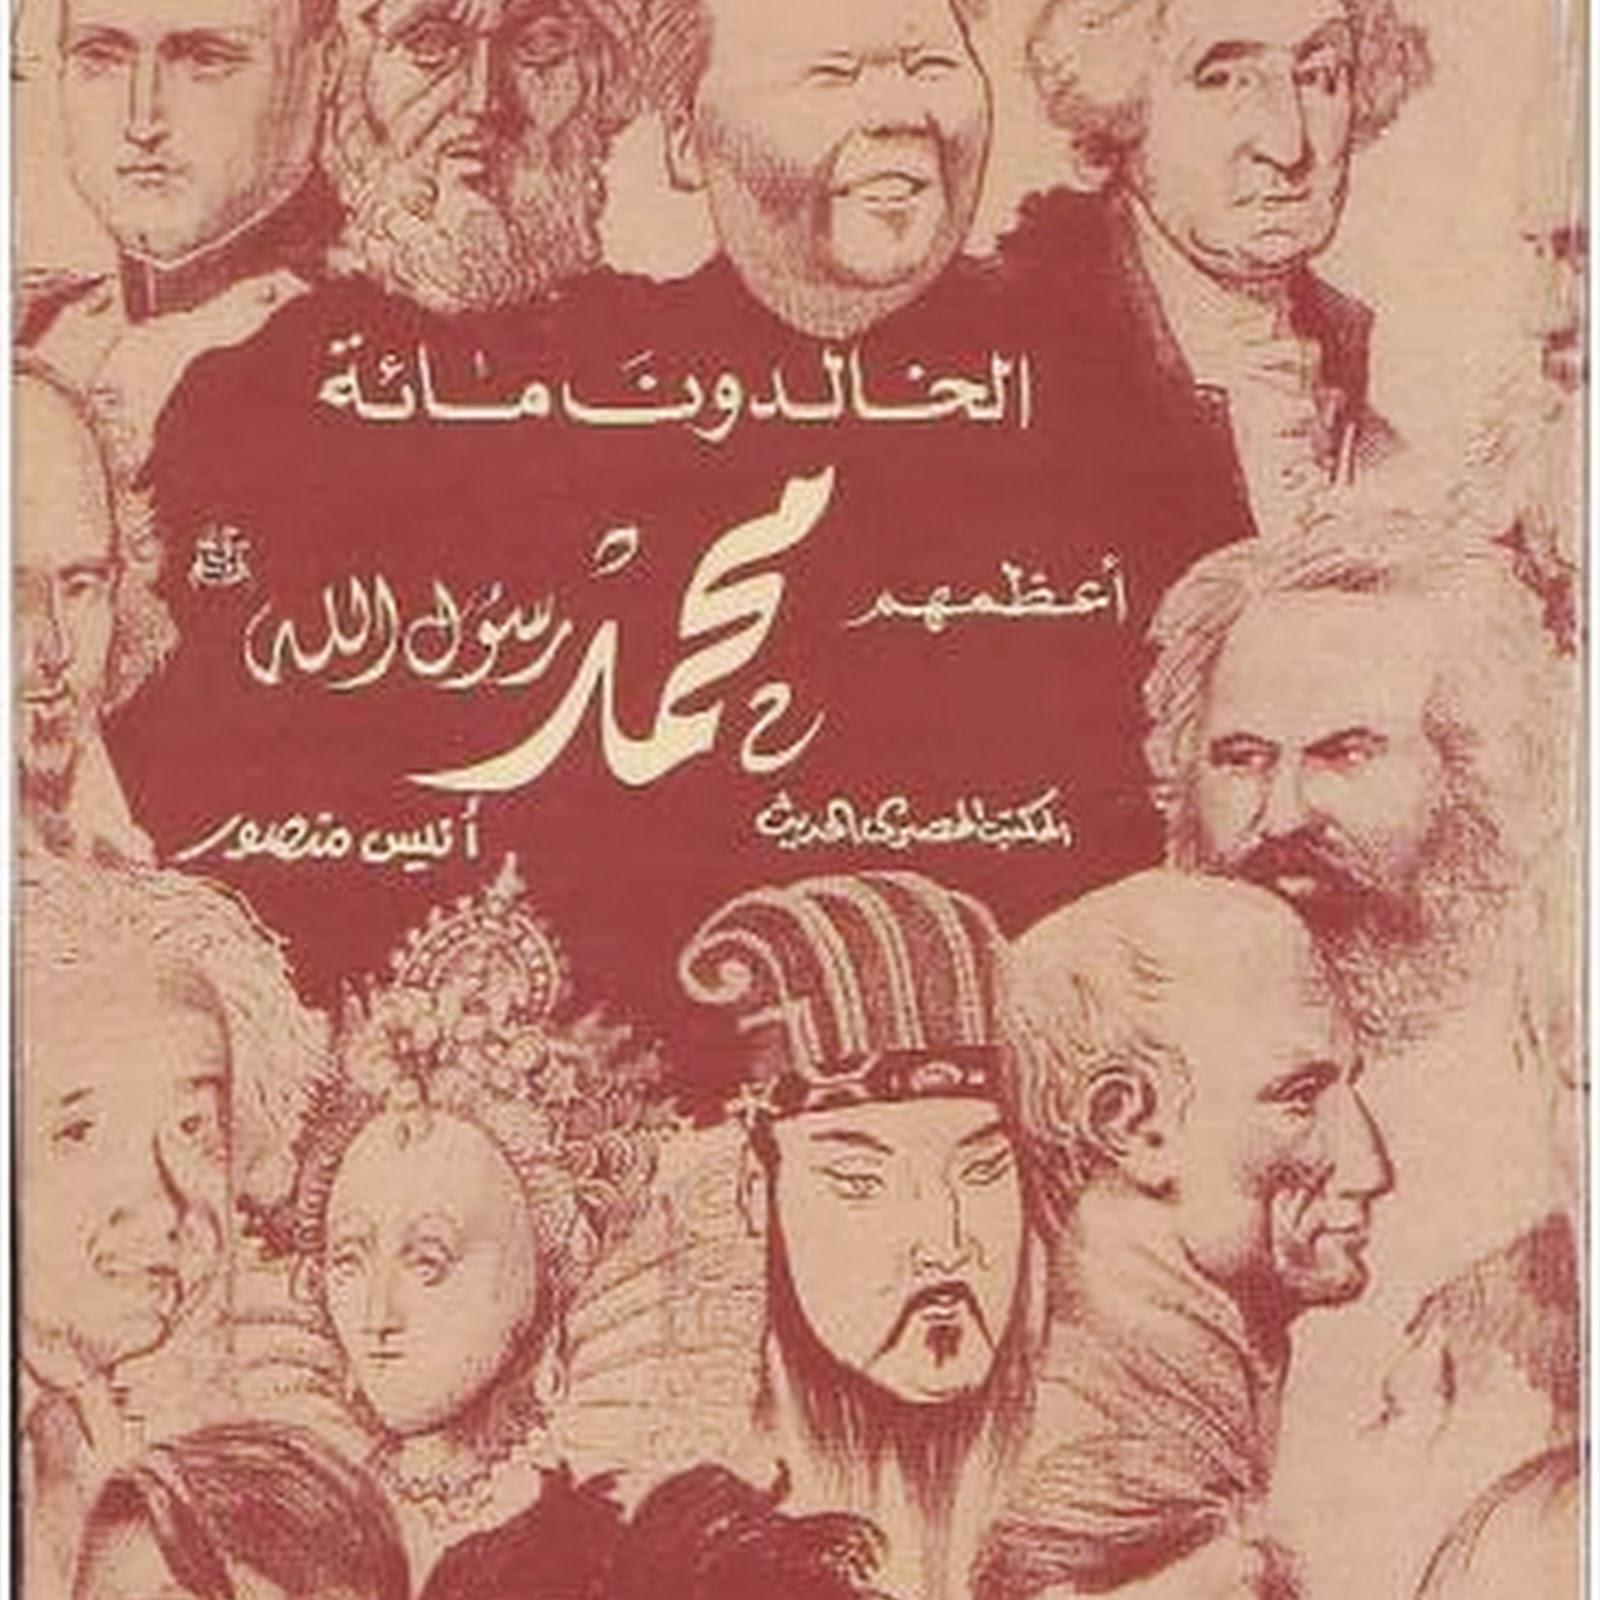 Photo of كتاب الخالدون مائة أعظمهم محمد صلى الله عليه وسلم Pdf للكاتب أنيس منصور